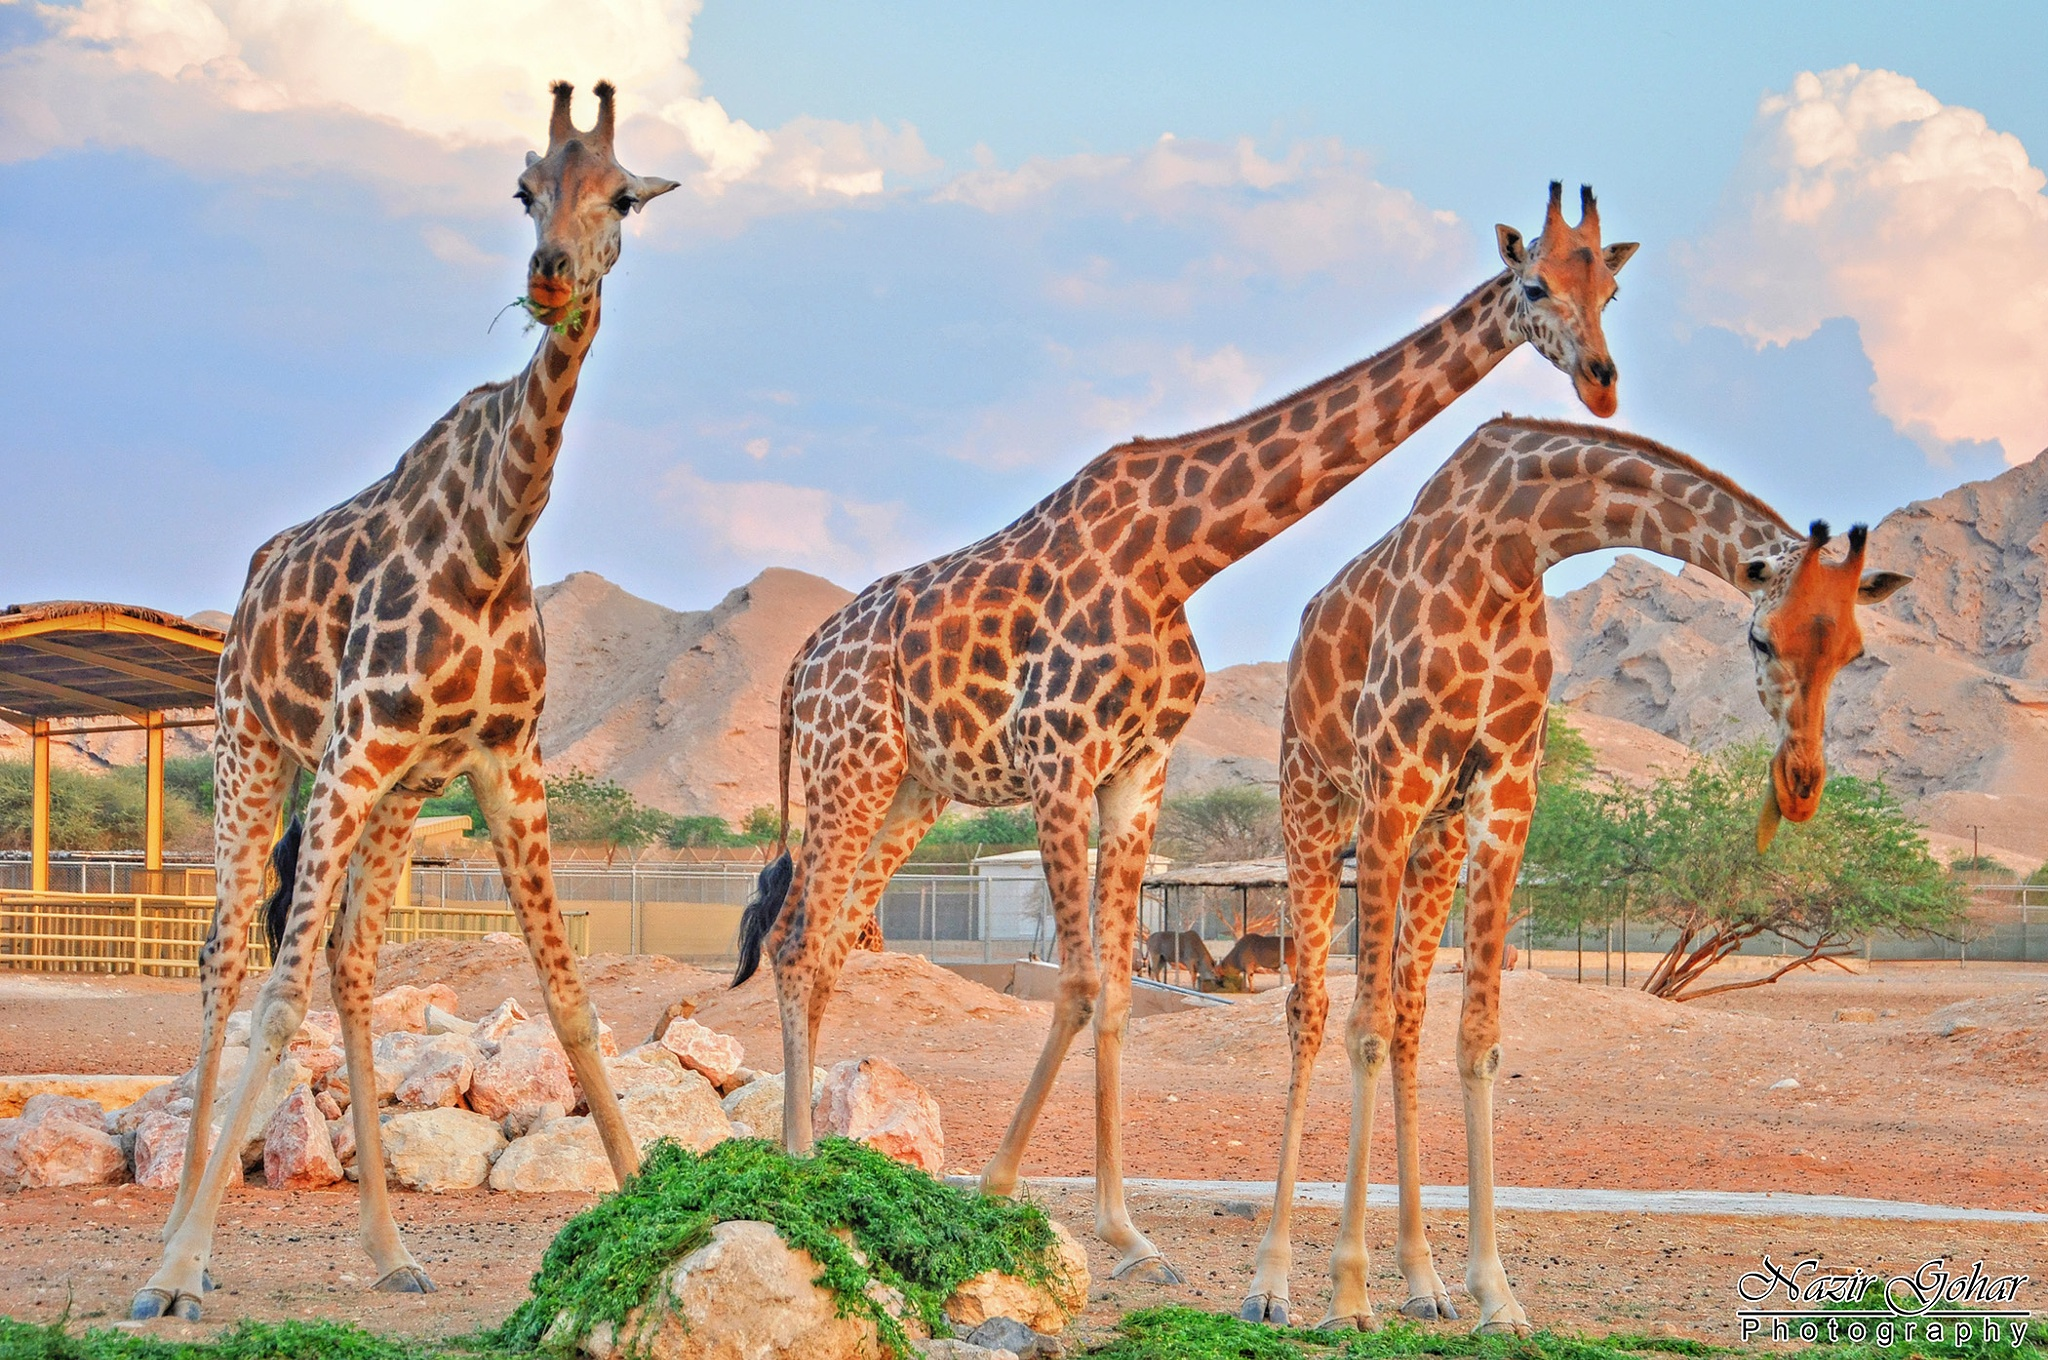 Giraffe 2 by Nazir Gohar